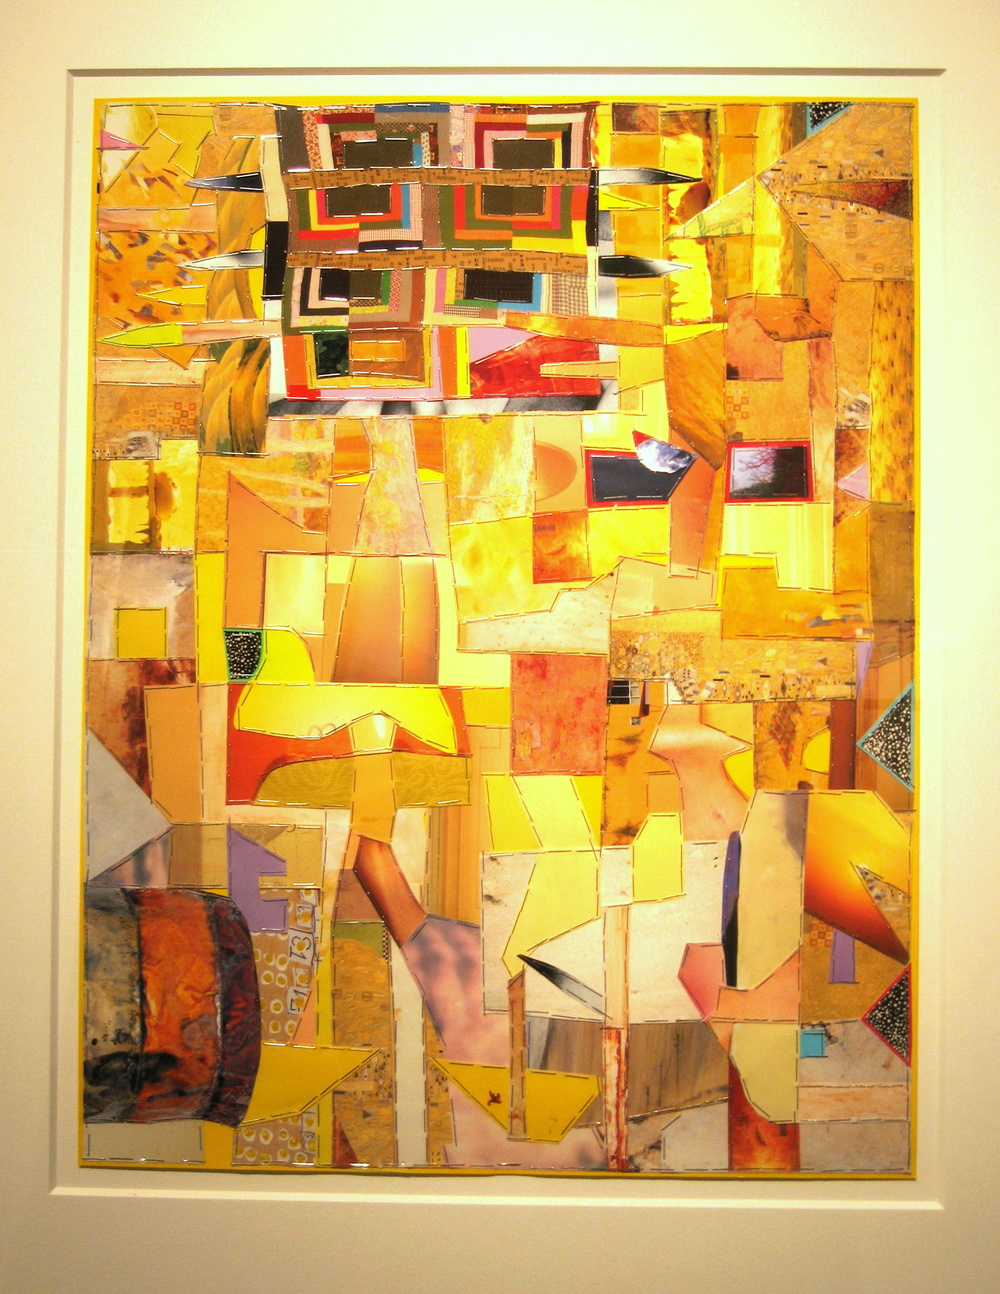 "17"" x 22"" - Stapled Collage"